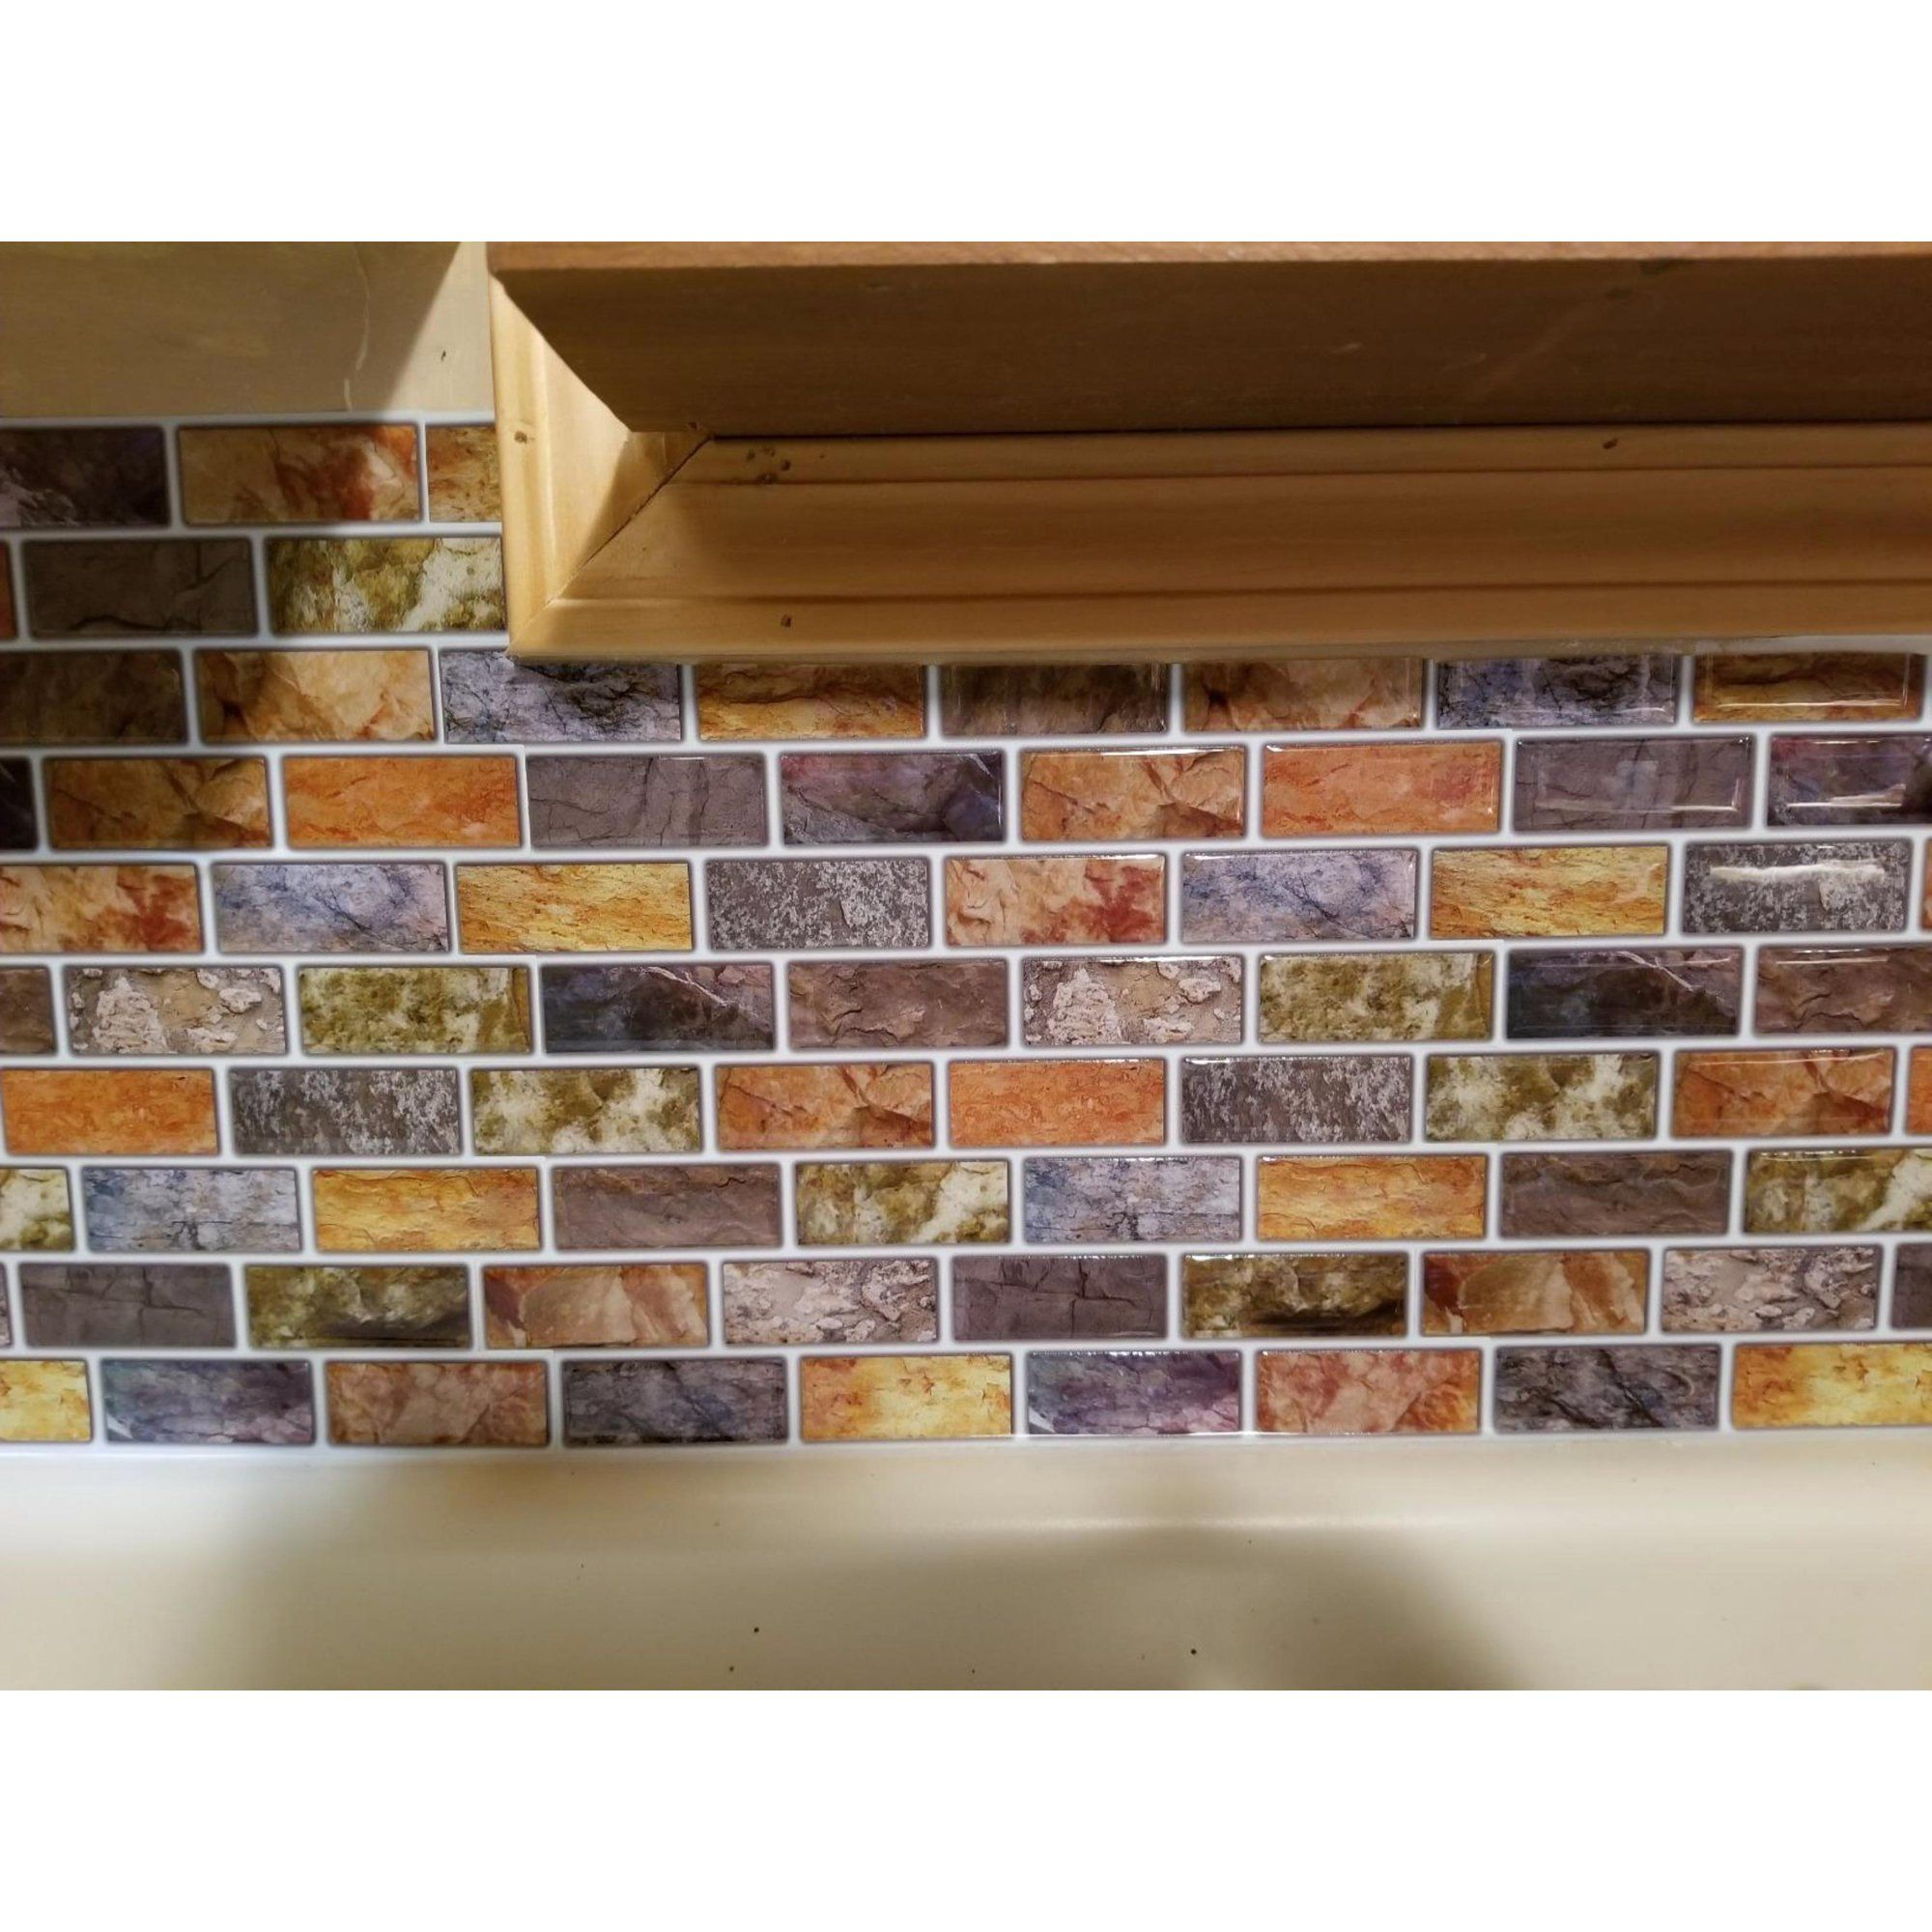 Art3d 10 Sheet Peel Stick Kitchen Backsplash Sticker 12 X 12 Faux Ceramic Tile Design Walmart Com In 2020 Stick On Tiles Peel And Stick Tile Peel Stick Backsplash